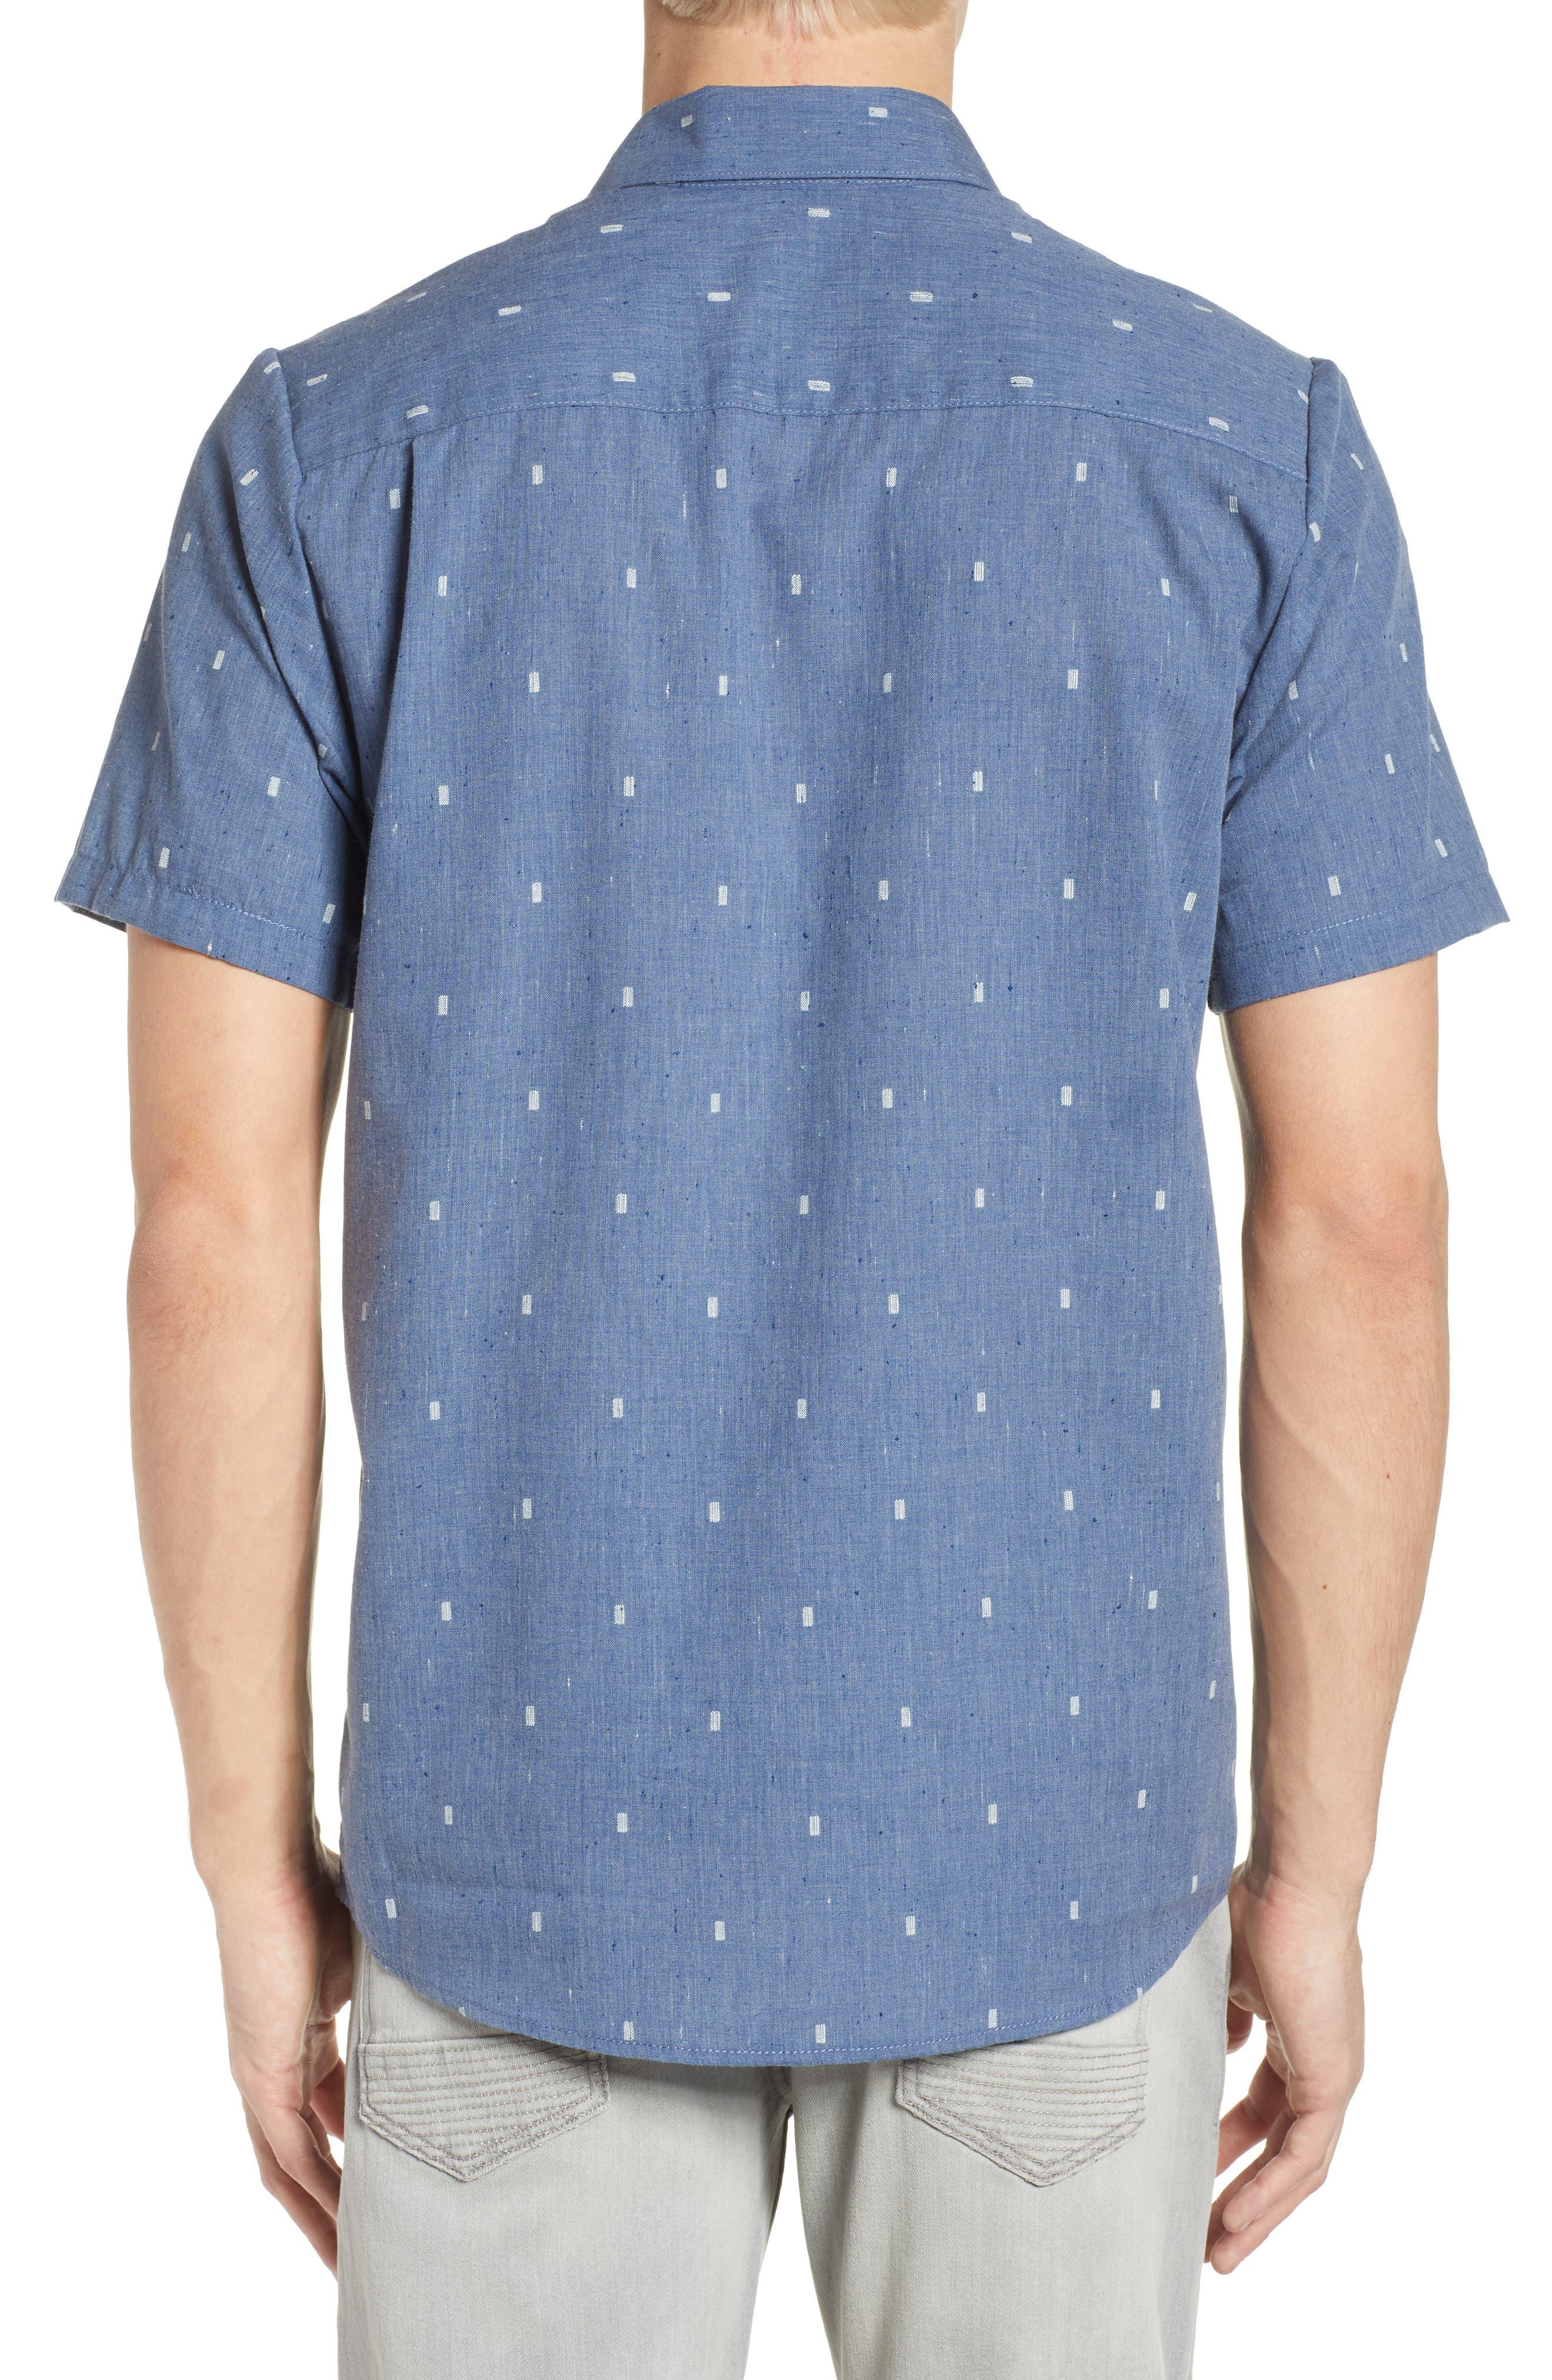 Gladstone Short Sleeve Shirt,                             Alternate thumbnail 2, color,                             Deep Blue